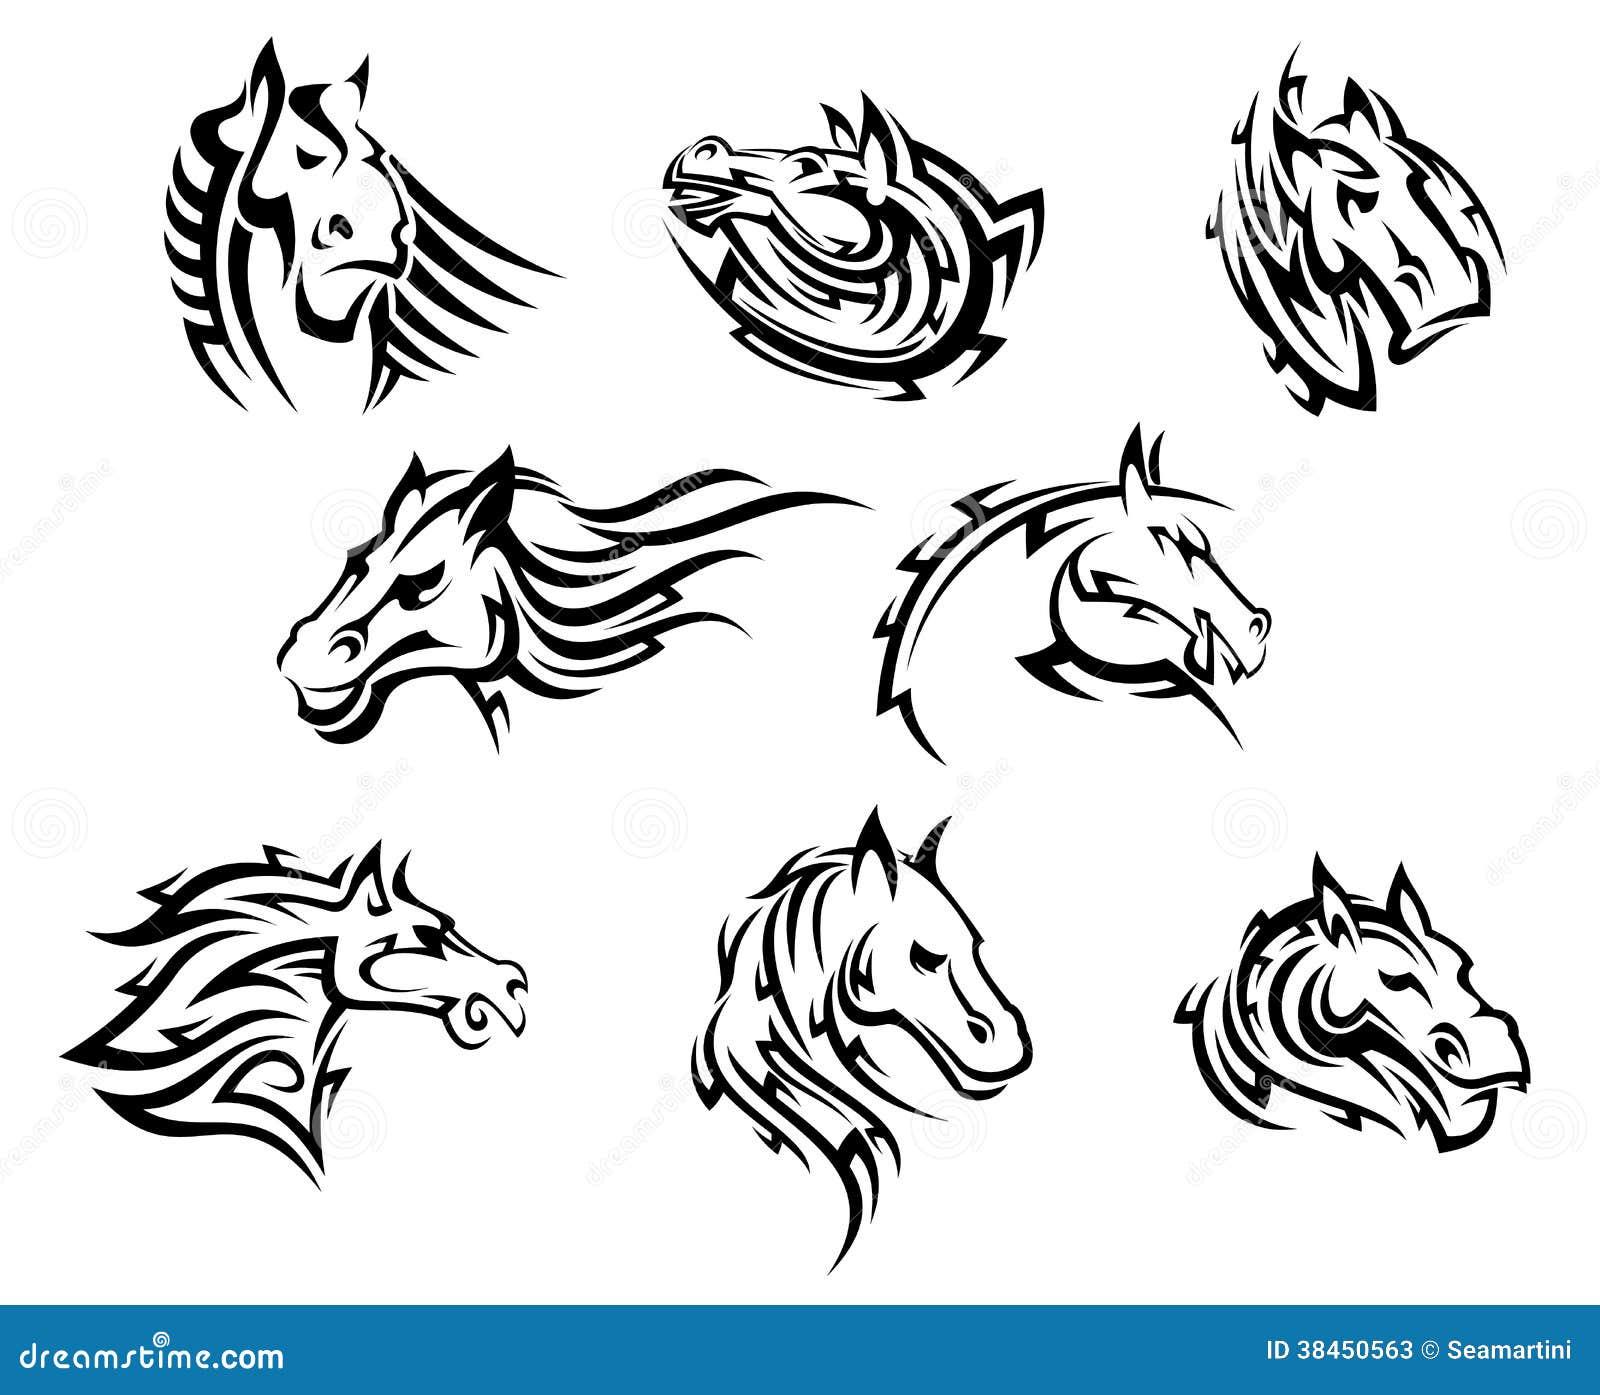 Cabezas De Dragones Para Tatuar tatuajes tribales de la cabeza de caballo ilustración del